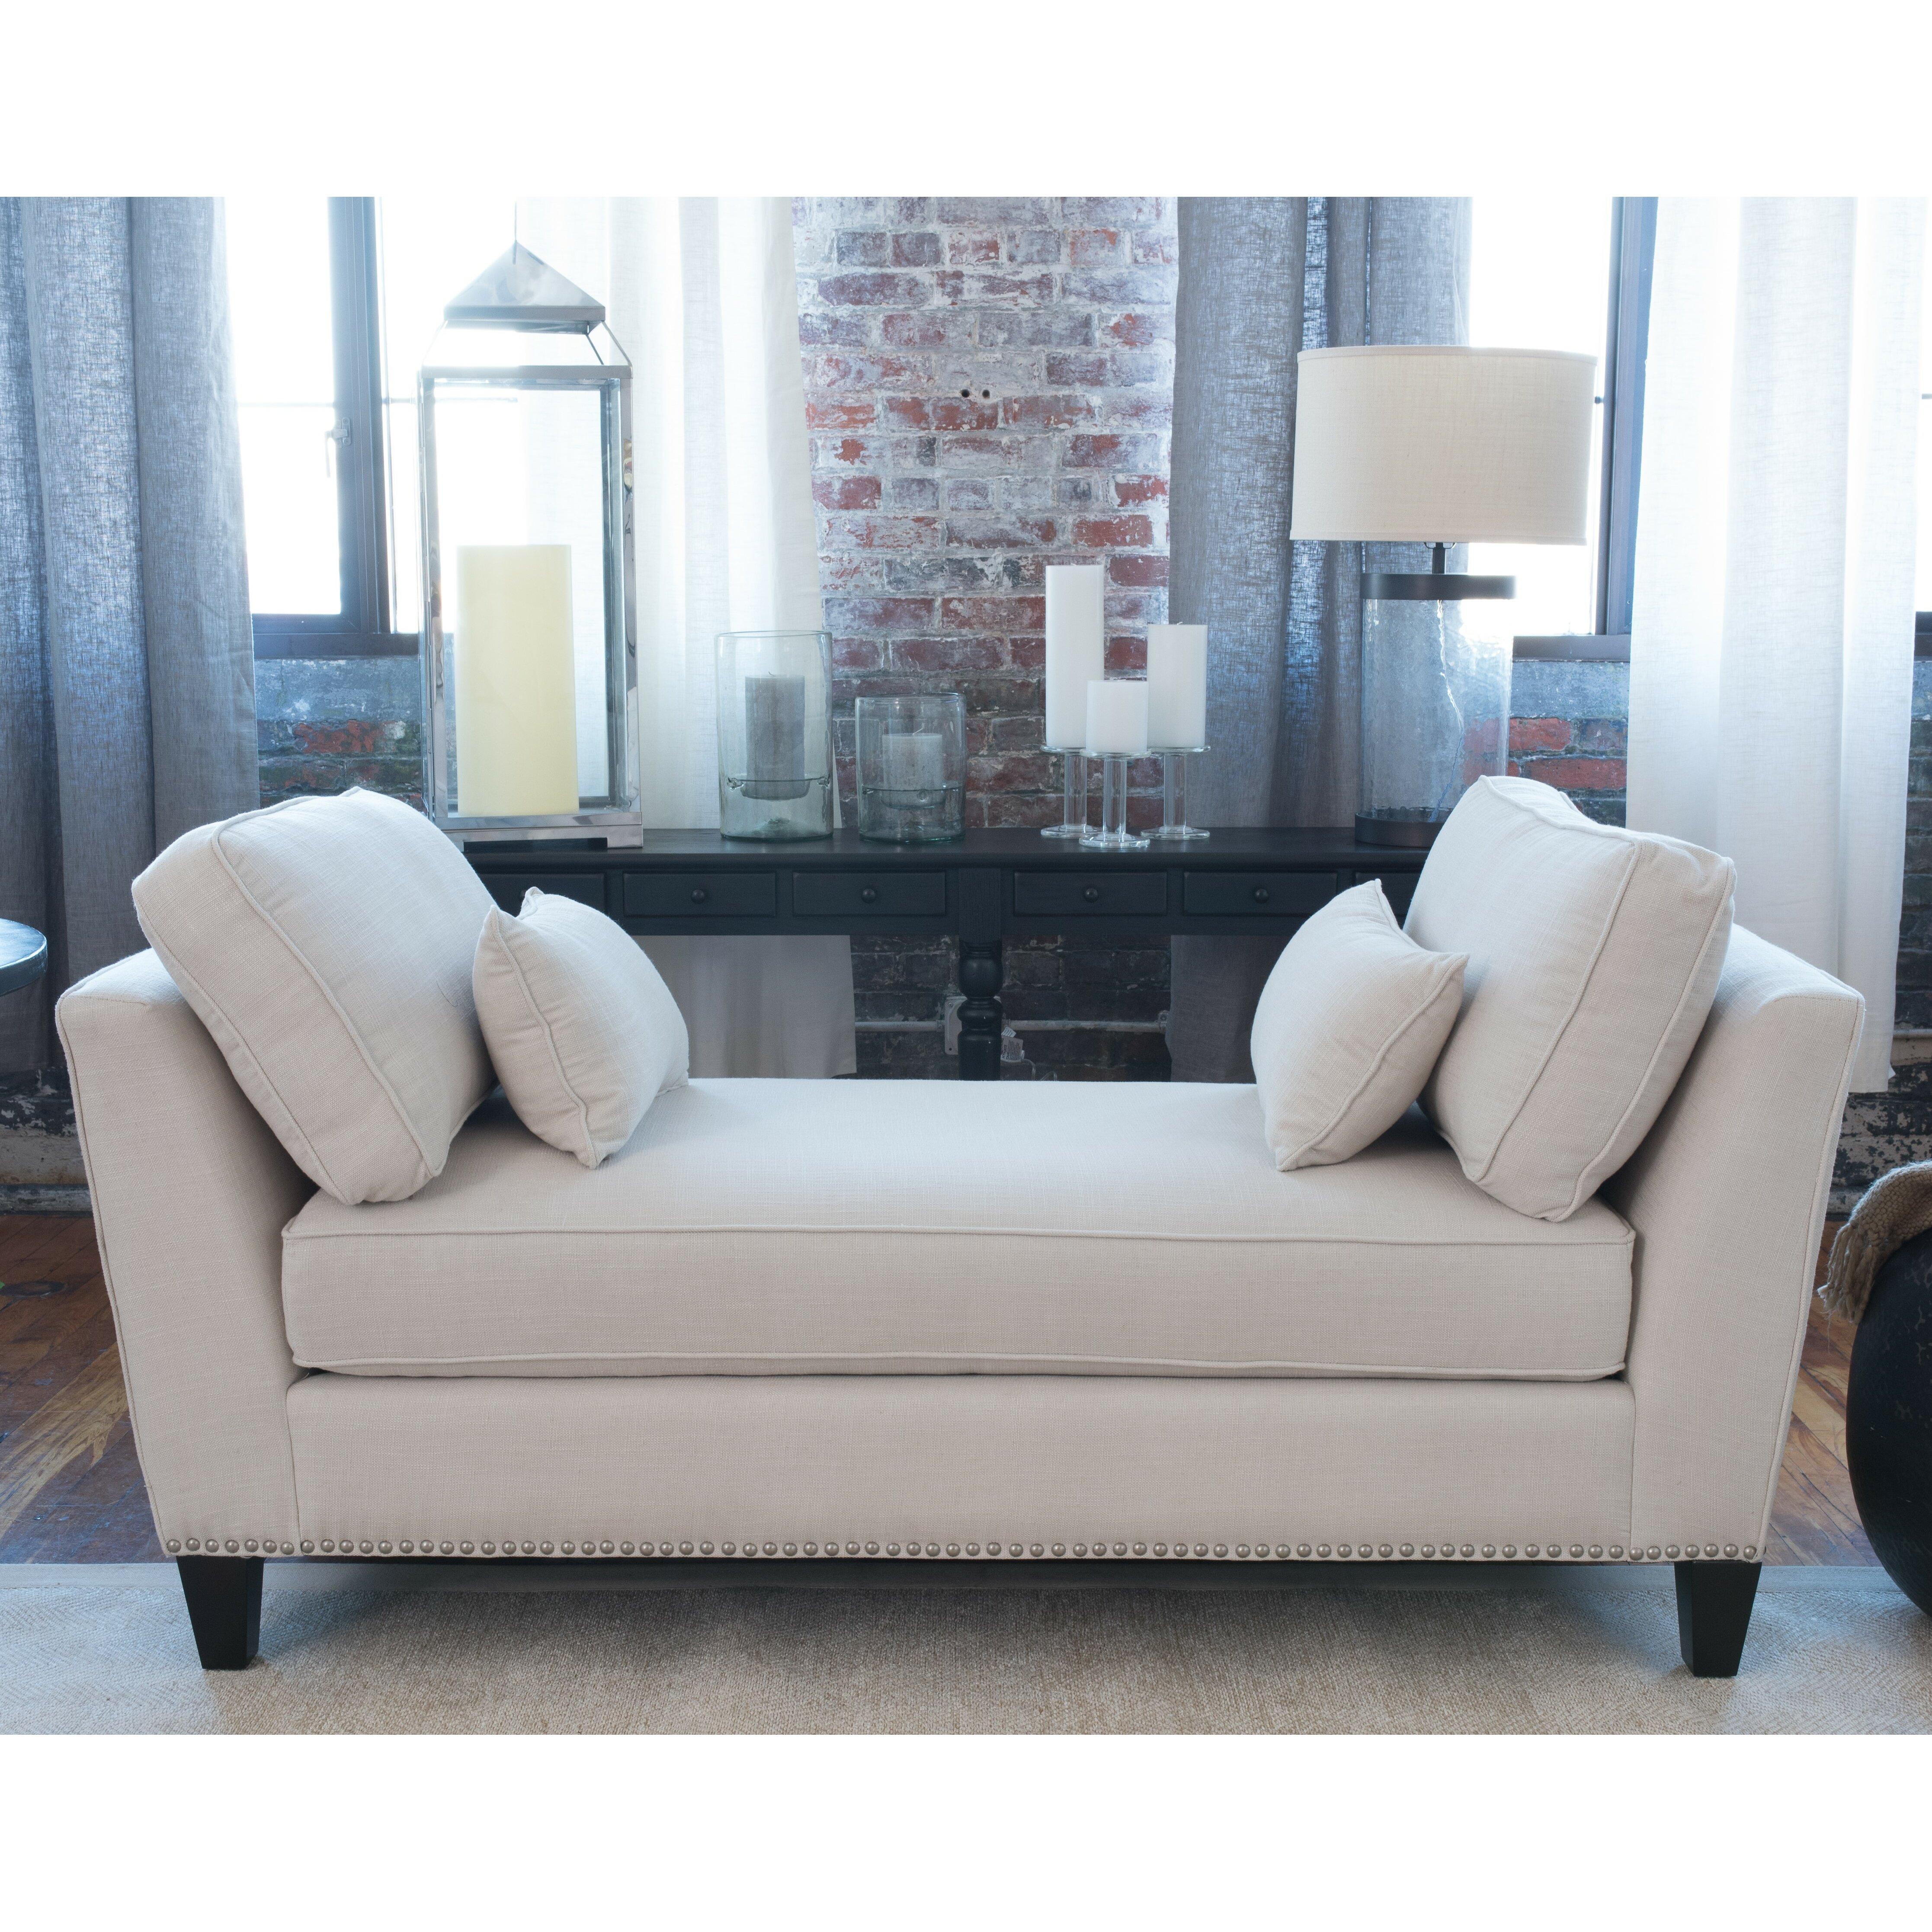 Home Element Furniture: South Beach Settee